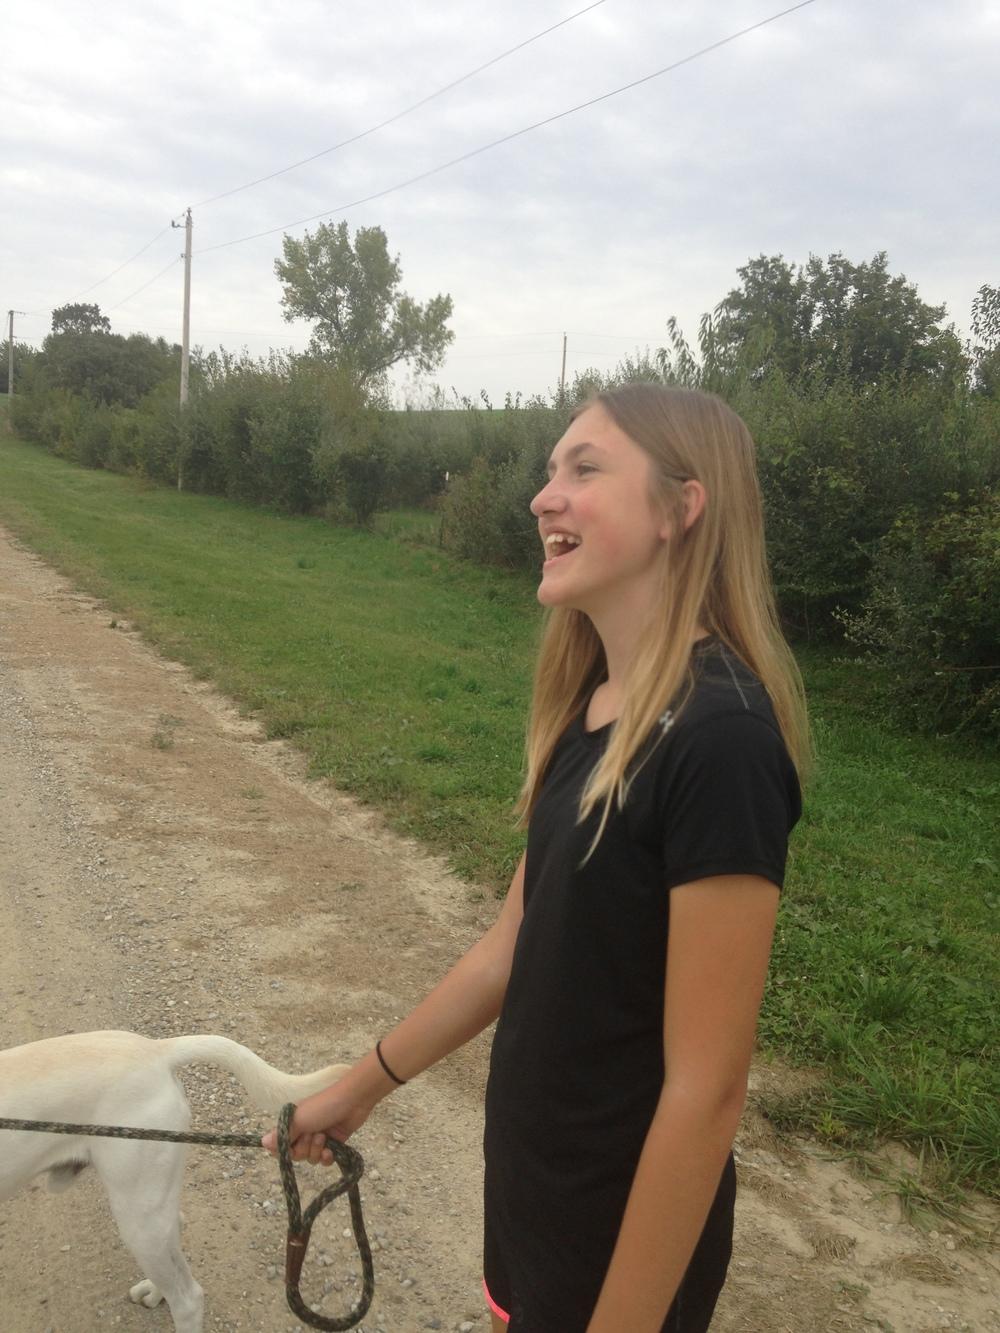 Ashlee-Happy-On-Walk.jpg